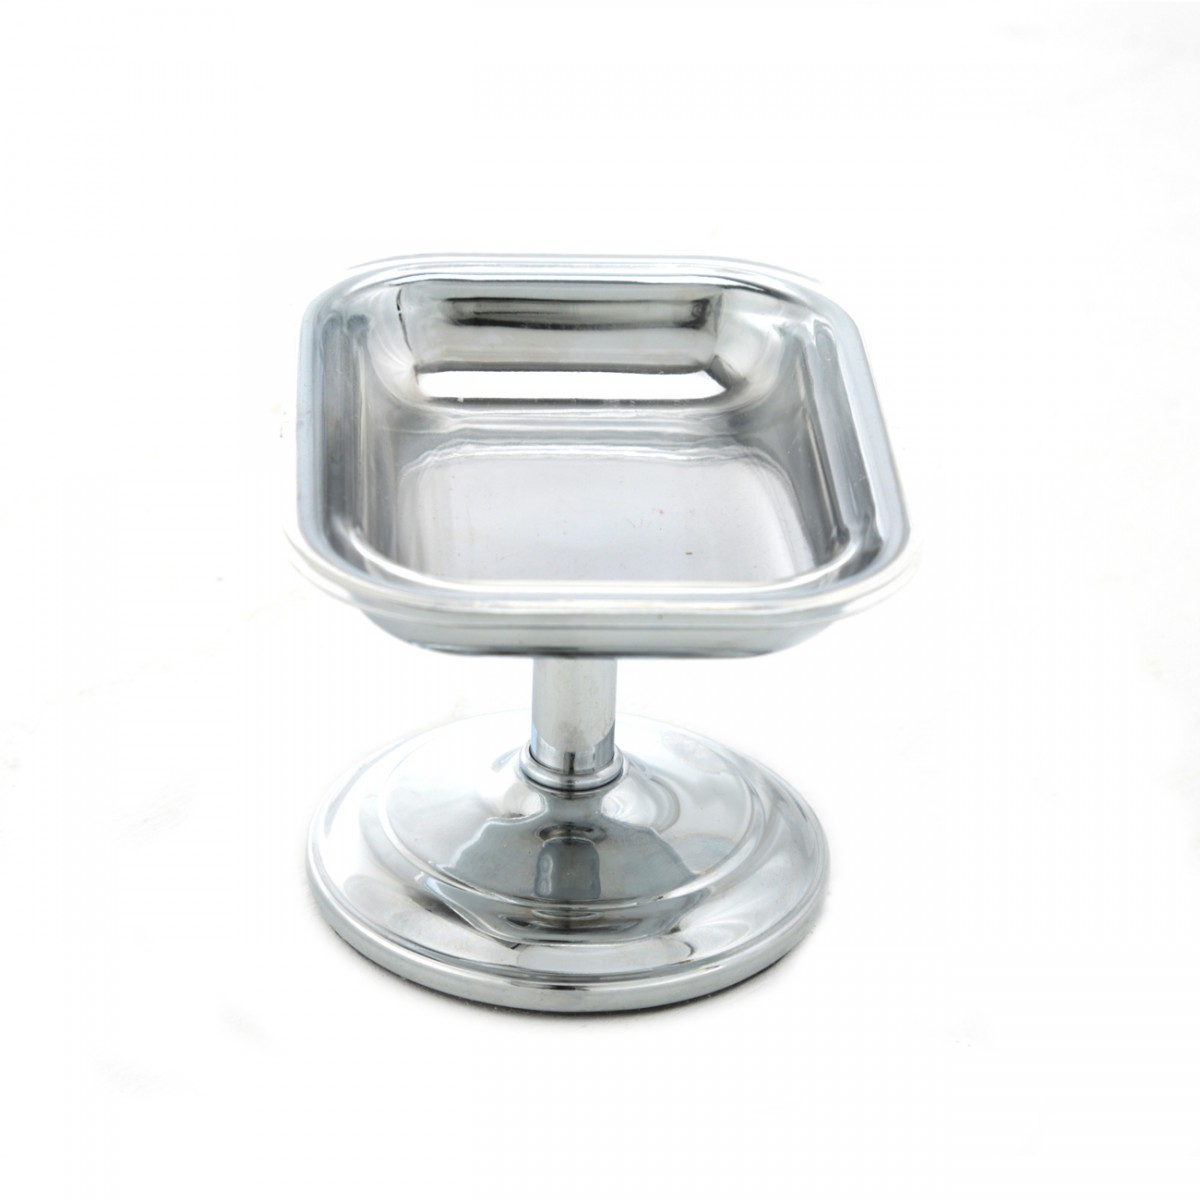 Freestanding Vintage Soap Dish Chrome Solid Brass Tray Bathroom Chrome Bar Soap Dish Tray Freestanding Portable Pedestal Soap Dish Antique Vintage Colonial Elegant Soap Dish Tray